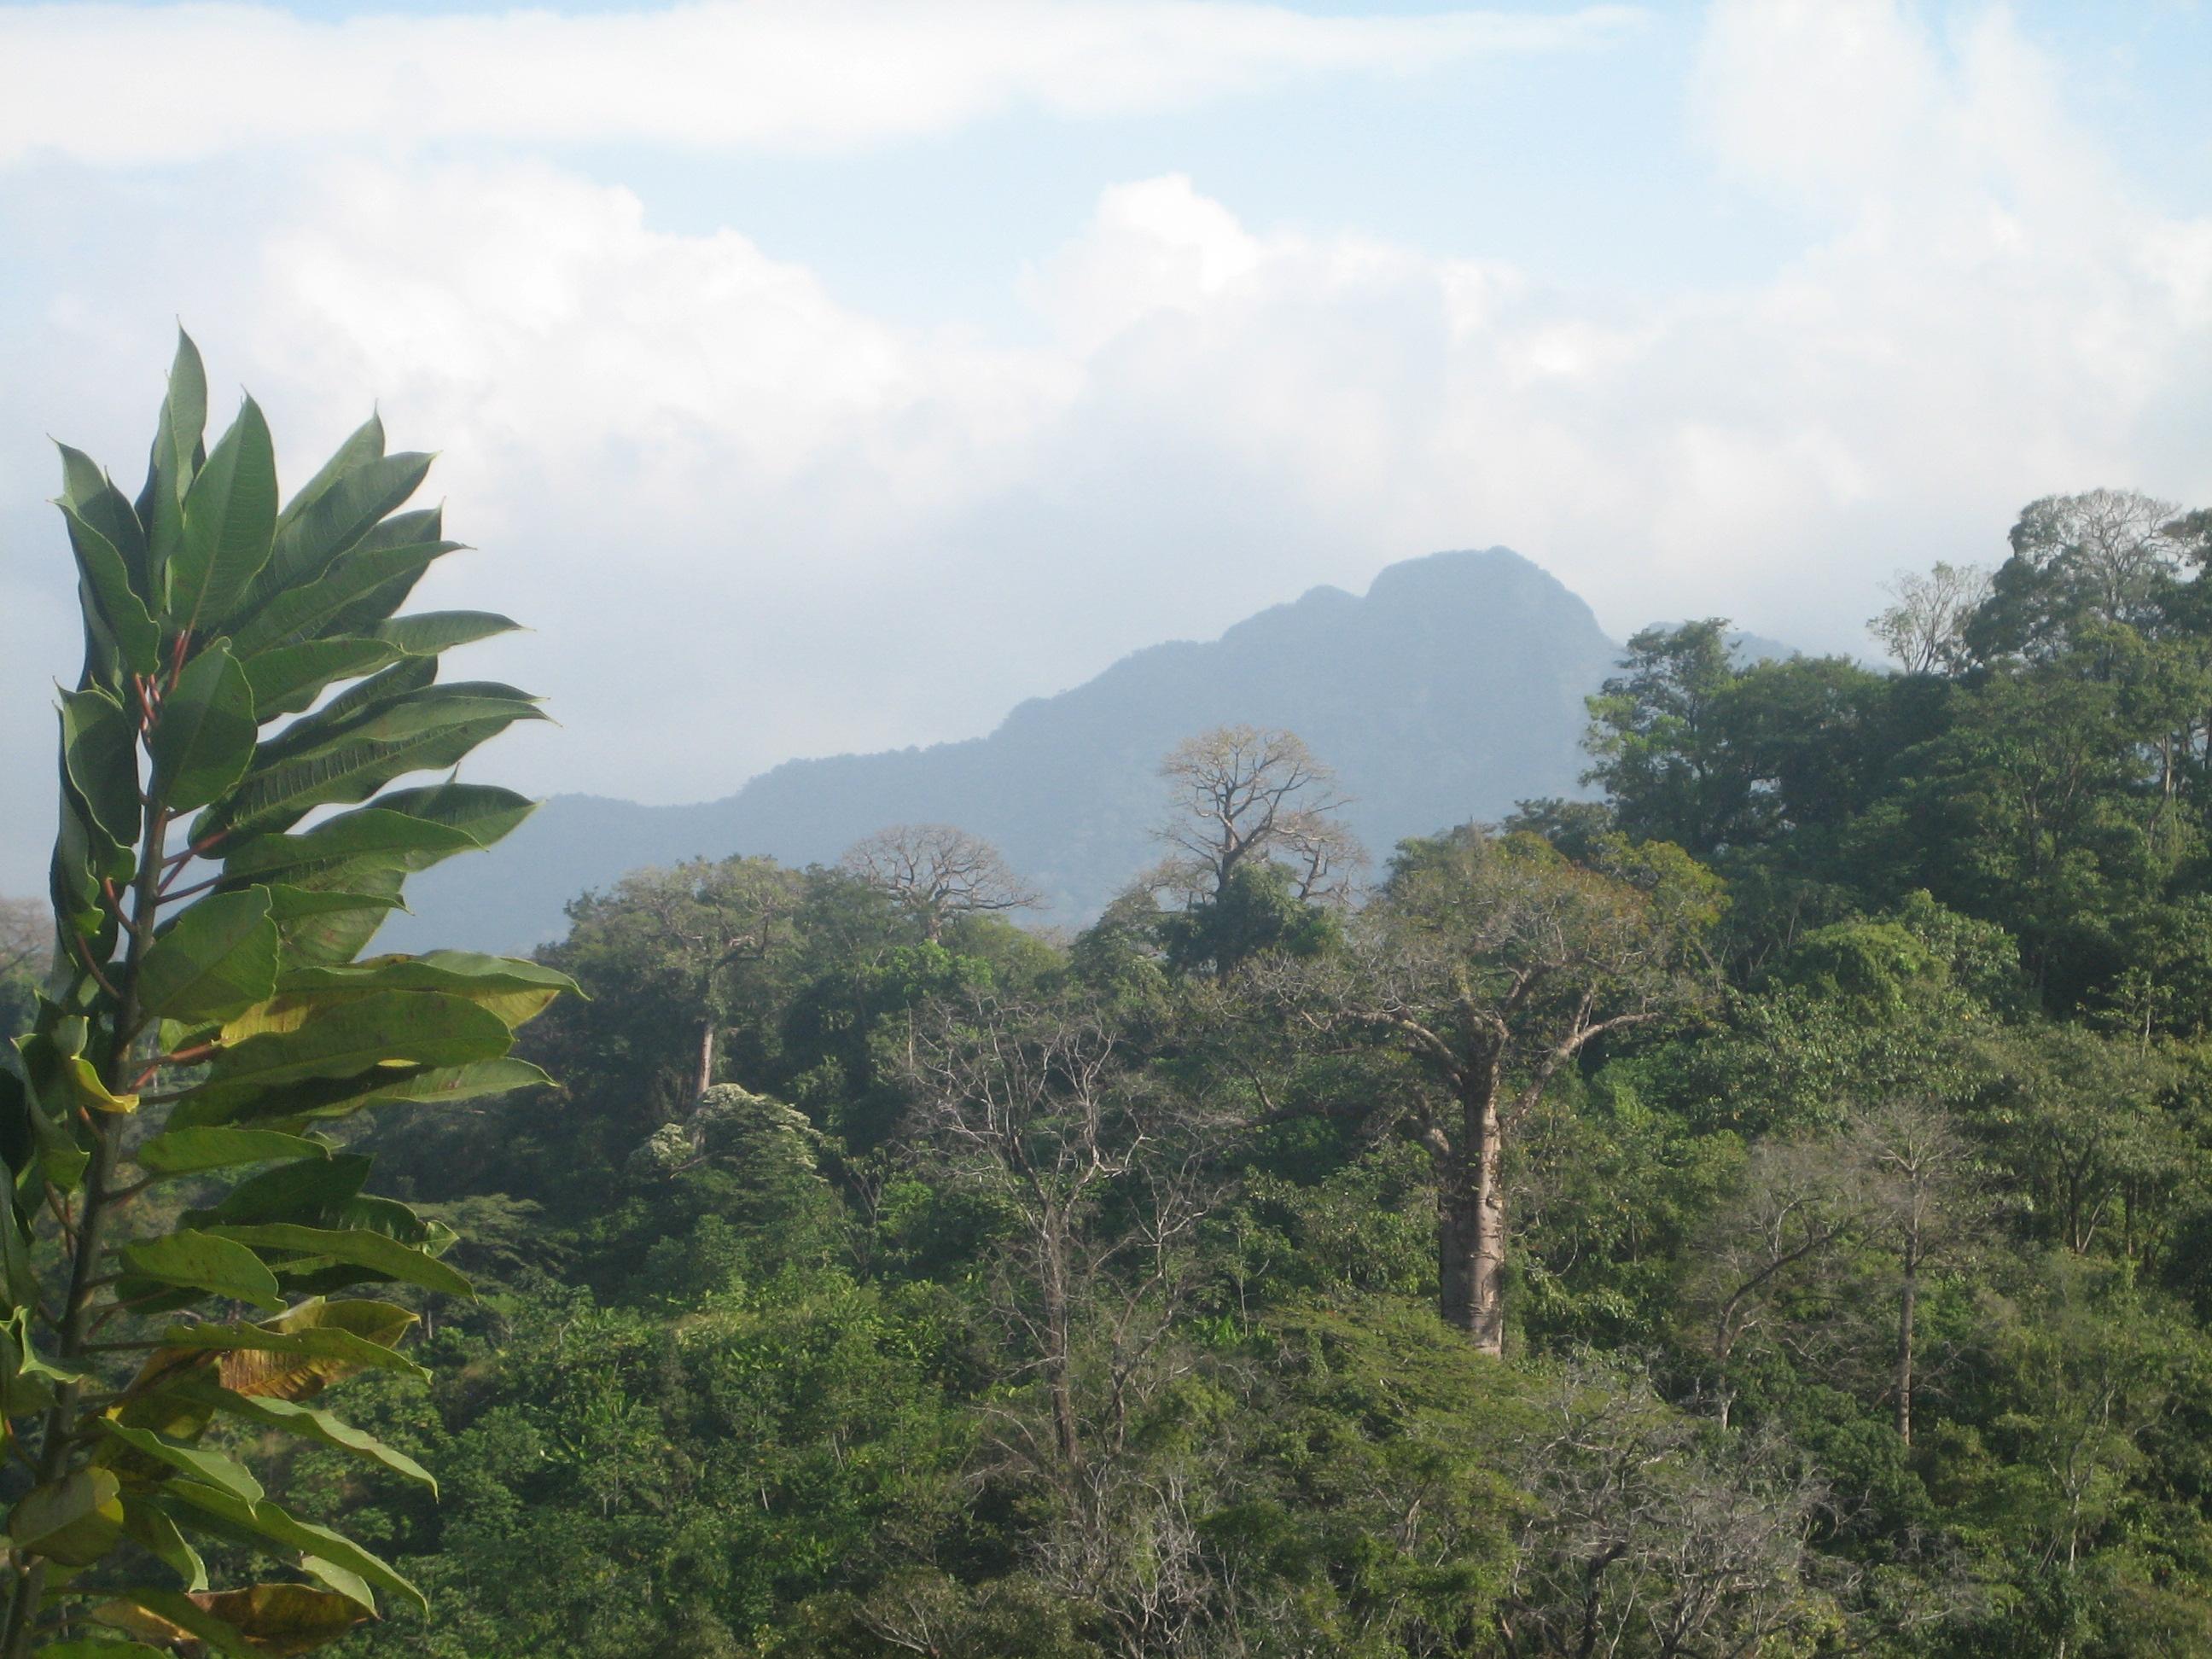 Rio Hondo landscape